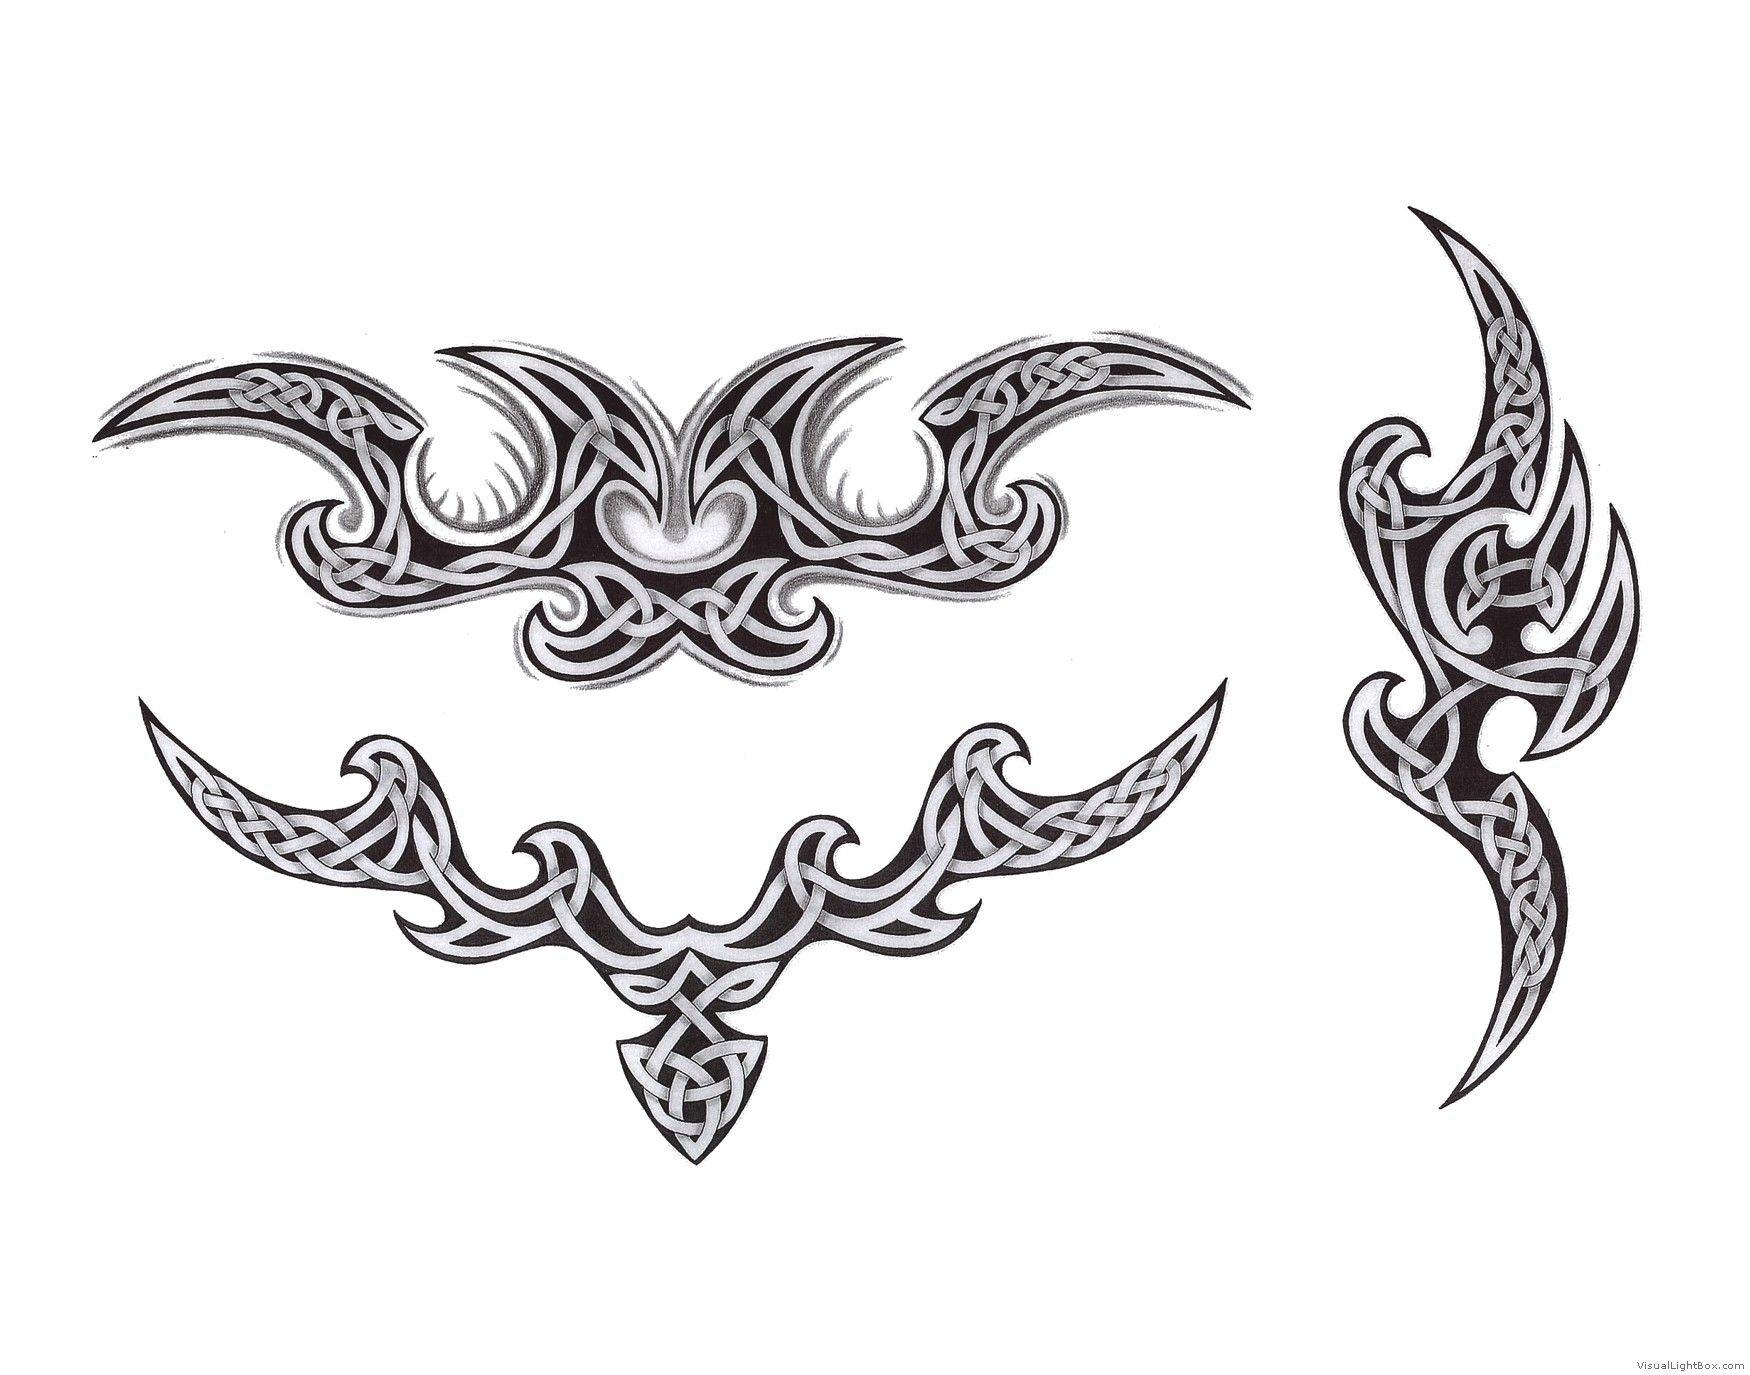 motif celtique signification recherche google celtic pattern pinterest pyrography. Black Bedroom Furniture Sets. Home Design Ideas